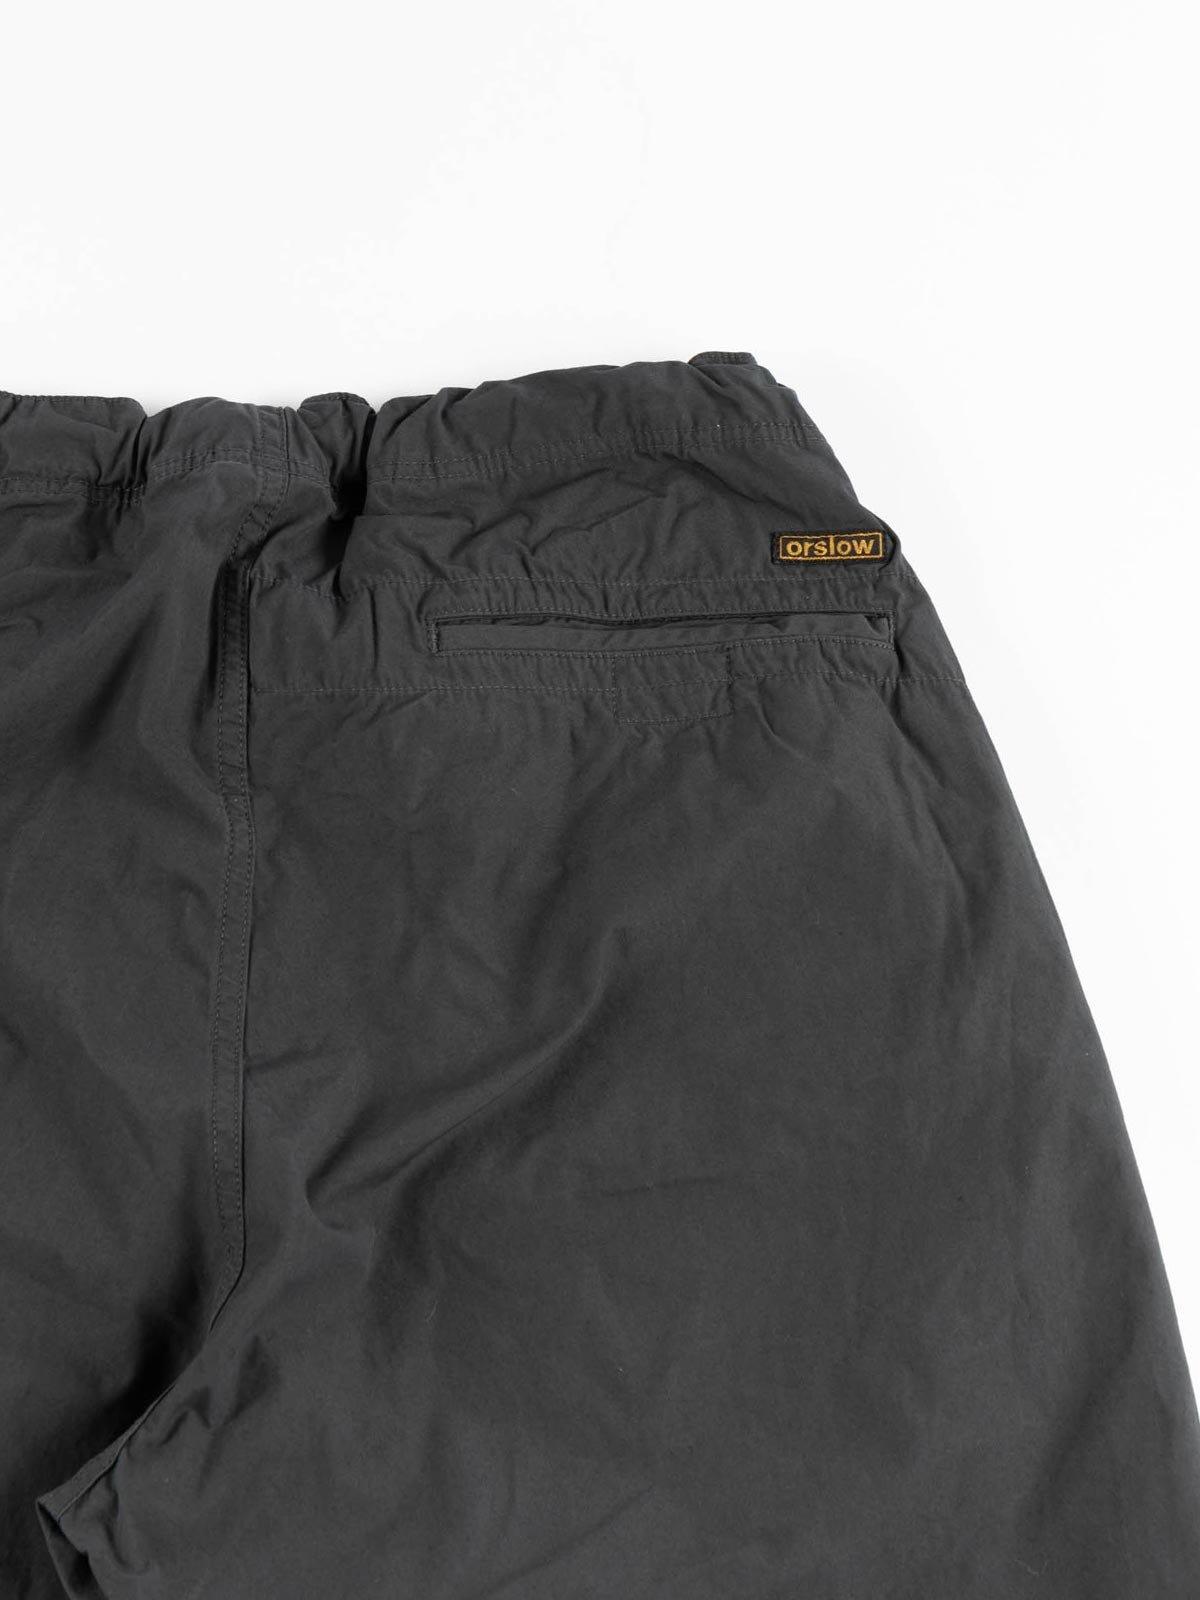 NEW YORKER SHORTS GRAY COTTON TYPEWRITER CLOTH - Image 3